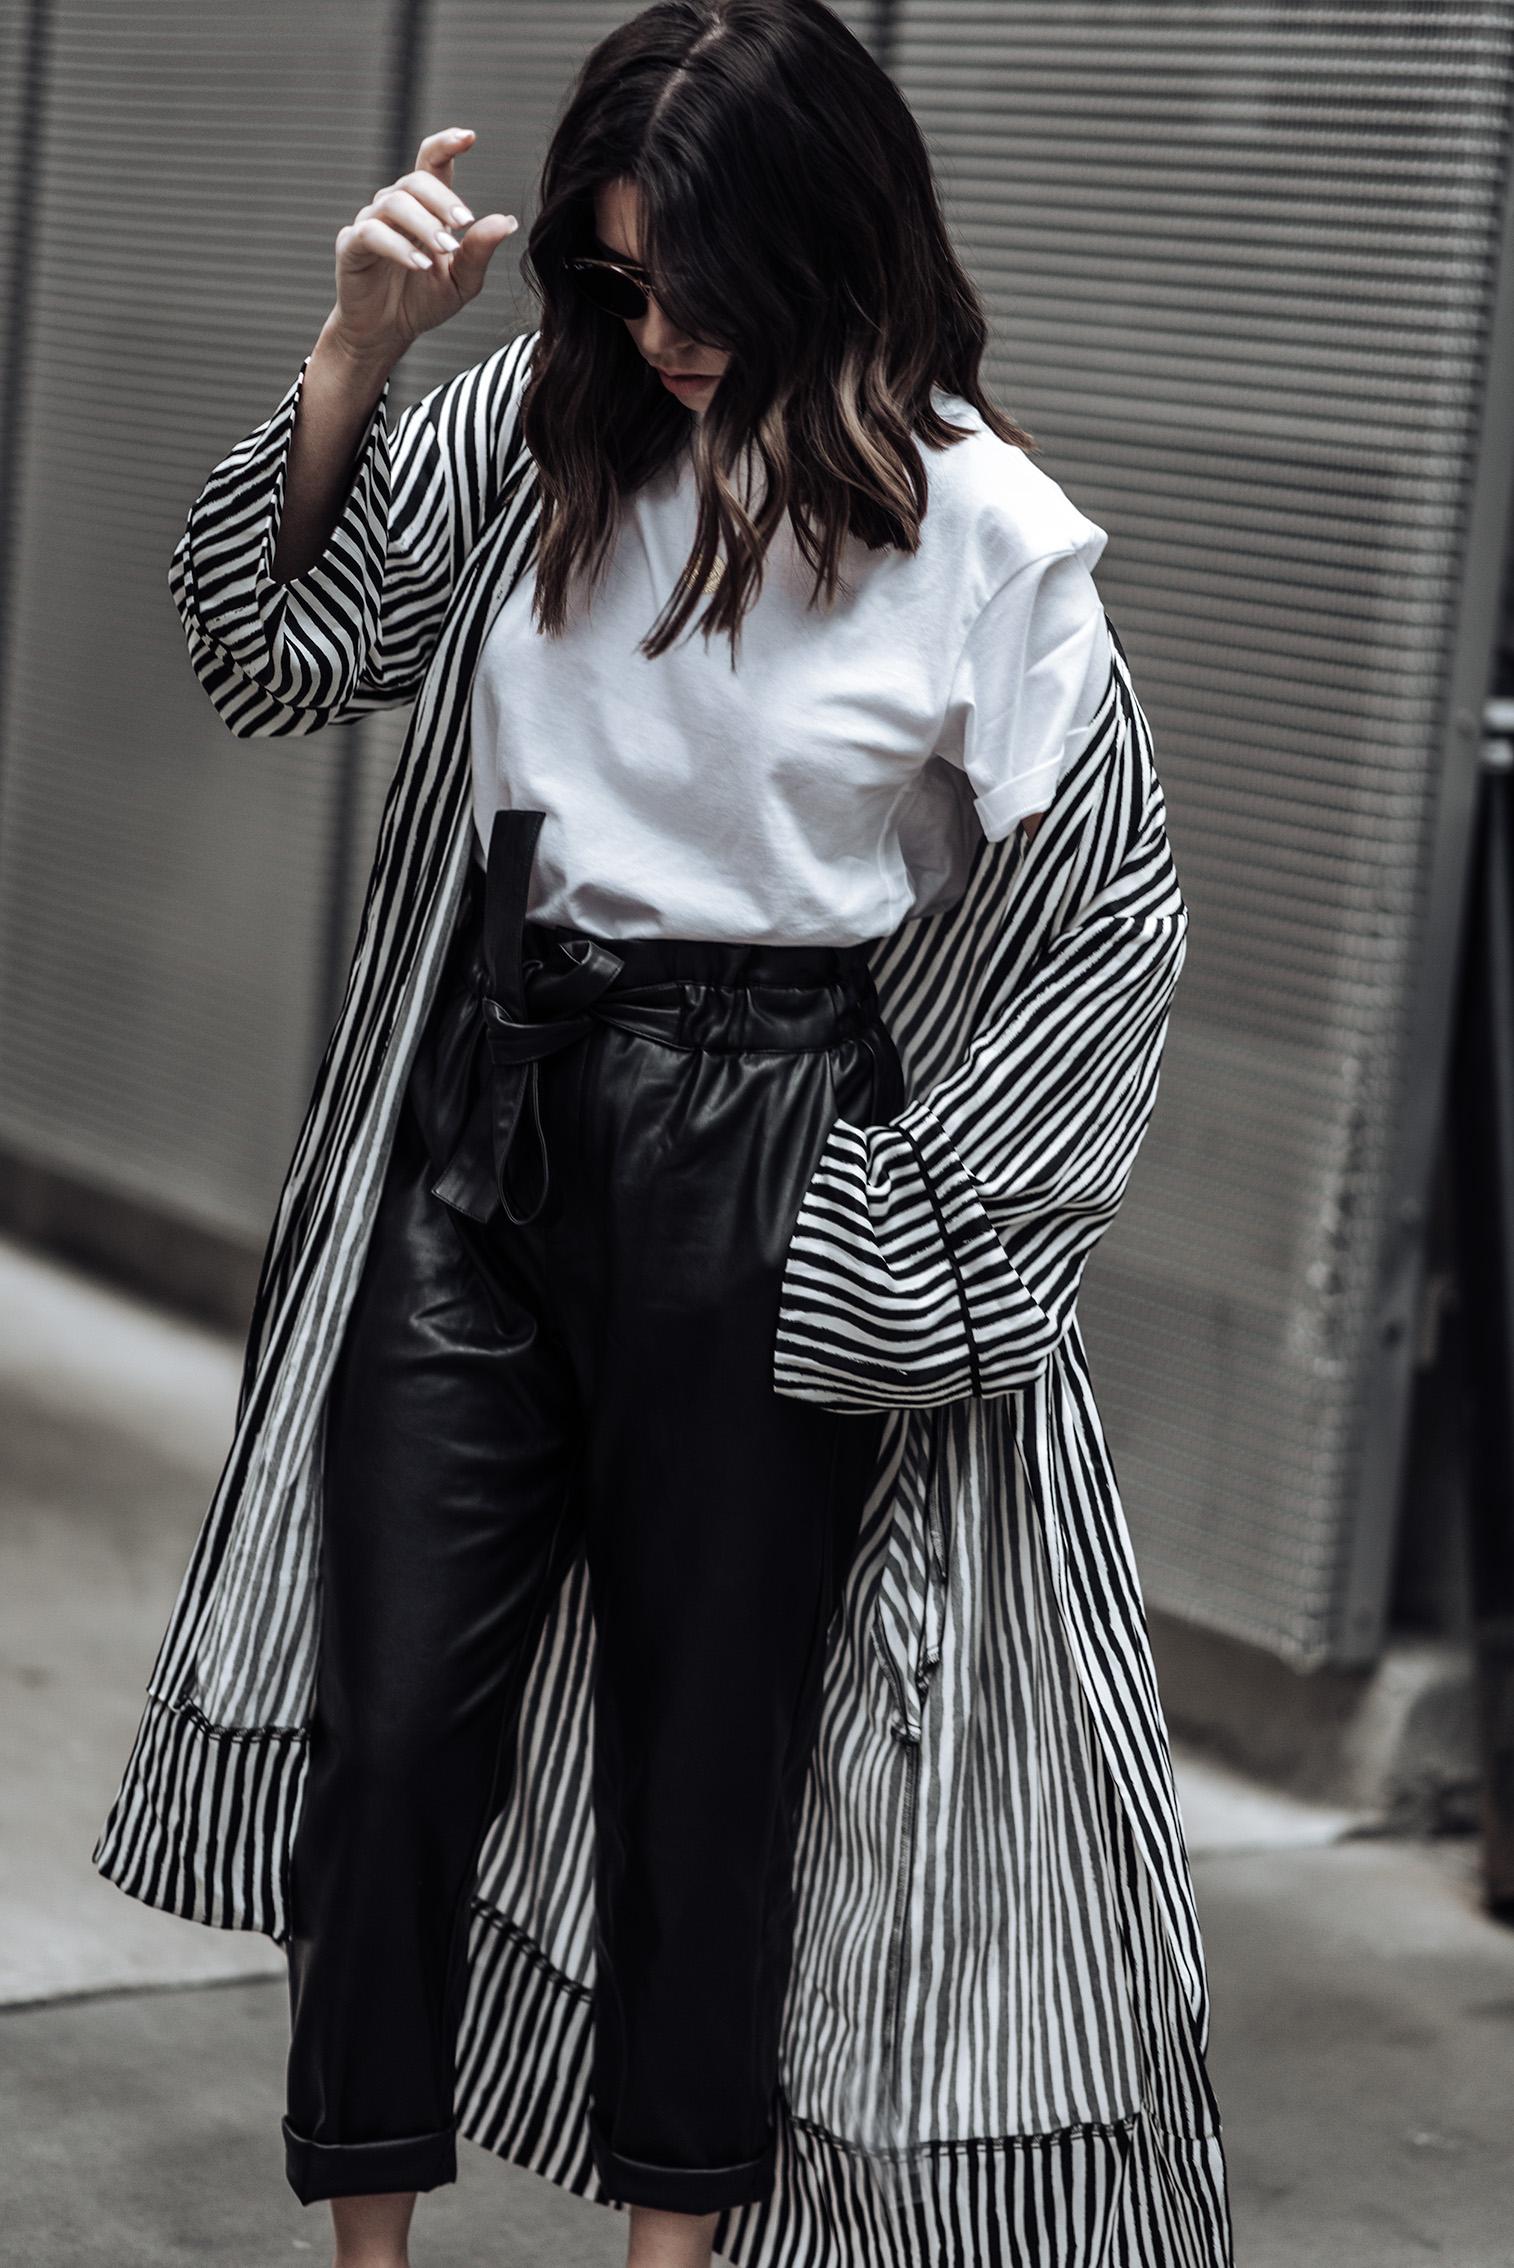 Leather tie waist pants (From Mango, identical here) | Stripe Kimono (Zara, similar here) | Slingback heels in black | Camilia Crossbody Box Bag| Mini Marie Pendant |Hanes X Karla tee (runs large, size down)